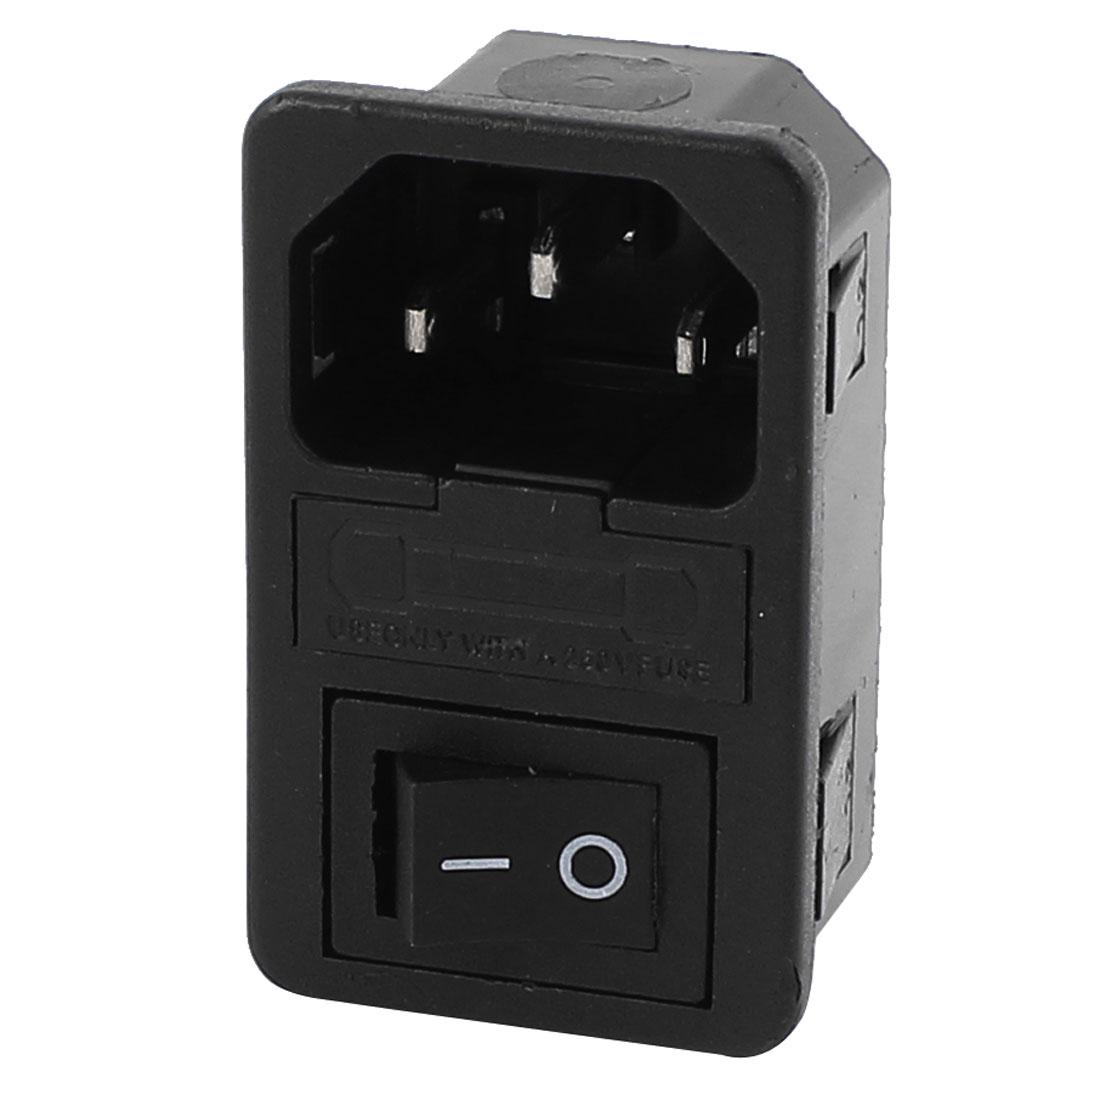 AC 250V 10A 2 Terminals Black Rocker Switch Inlet Power Socket w Fuse Holder